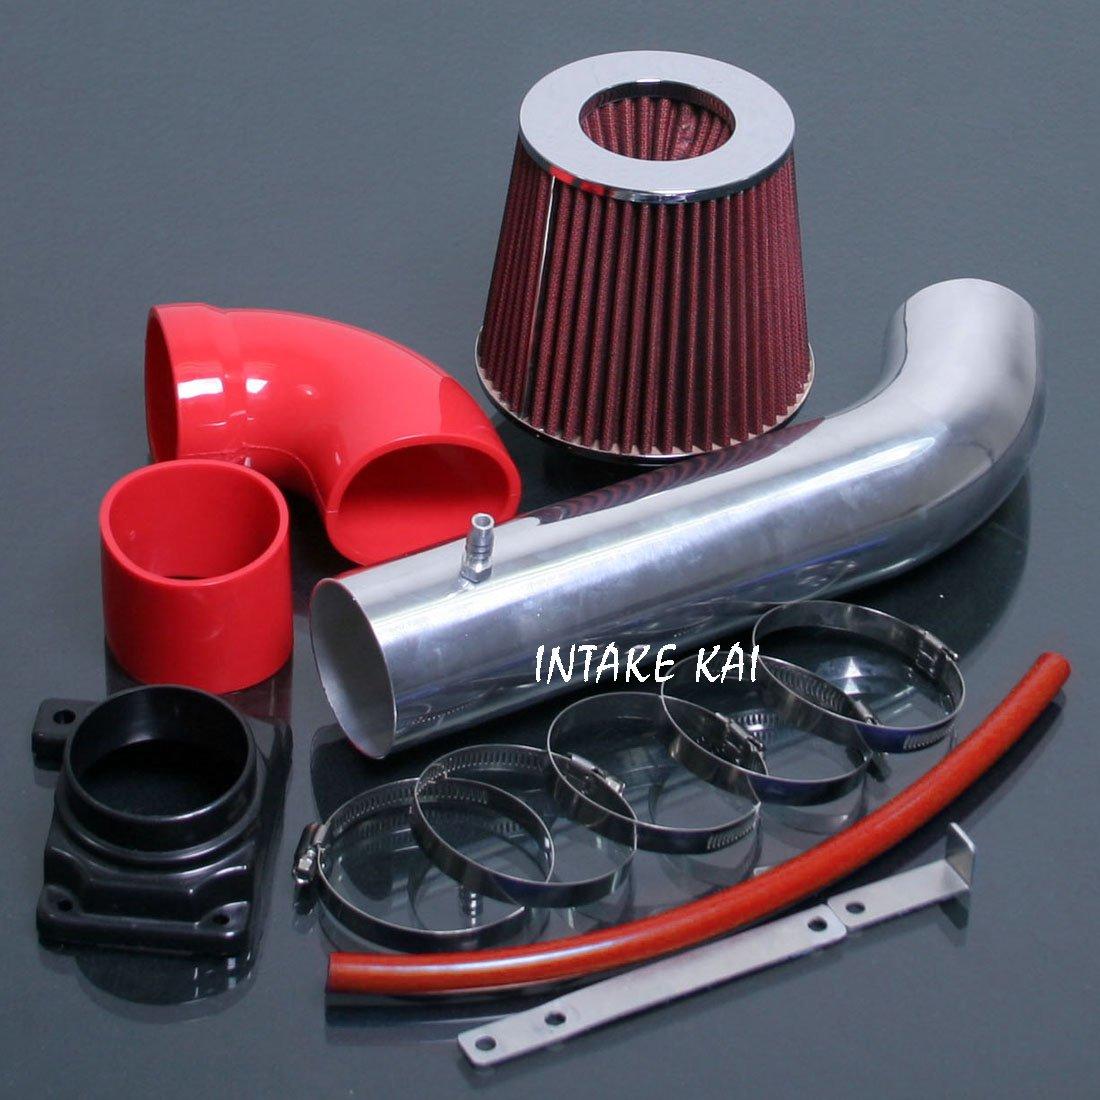 BLACK fit 2006-2011 MITSUBISHI ECLIPSE 2.4 2.4L COLD AIR INTAKE KIT SYSTEM